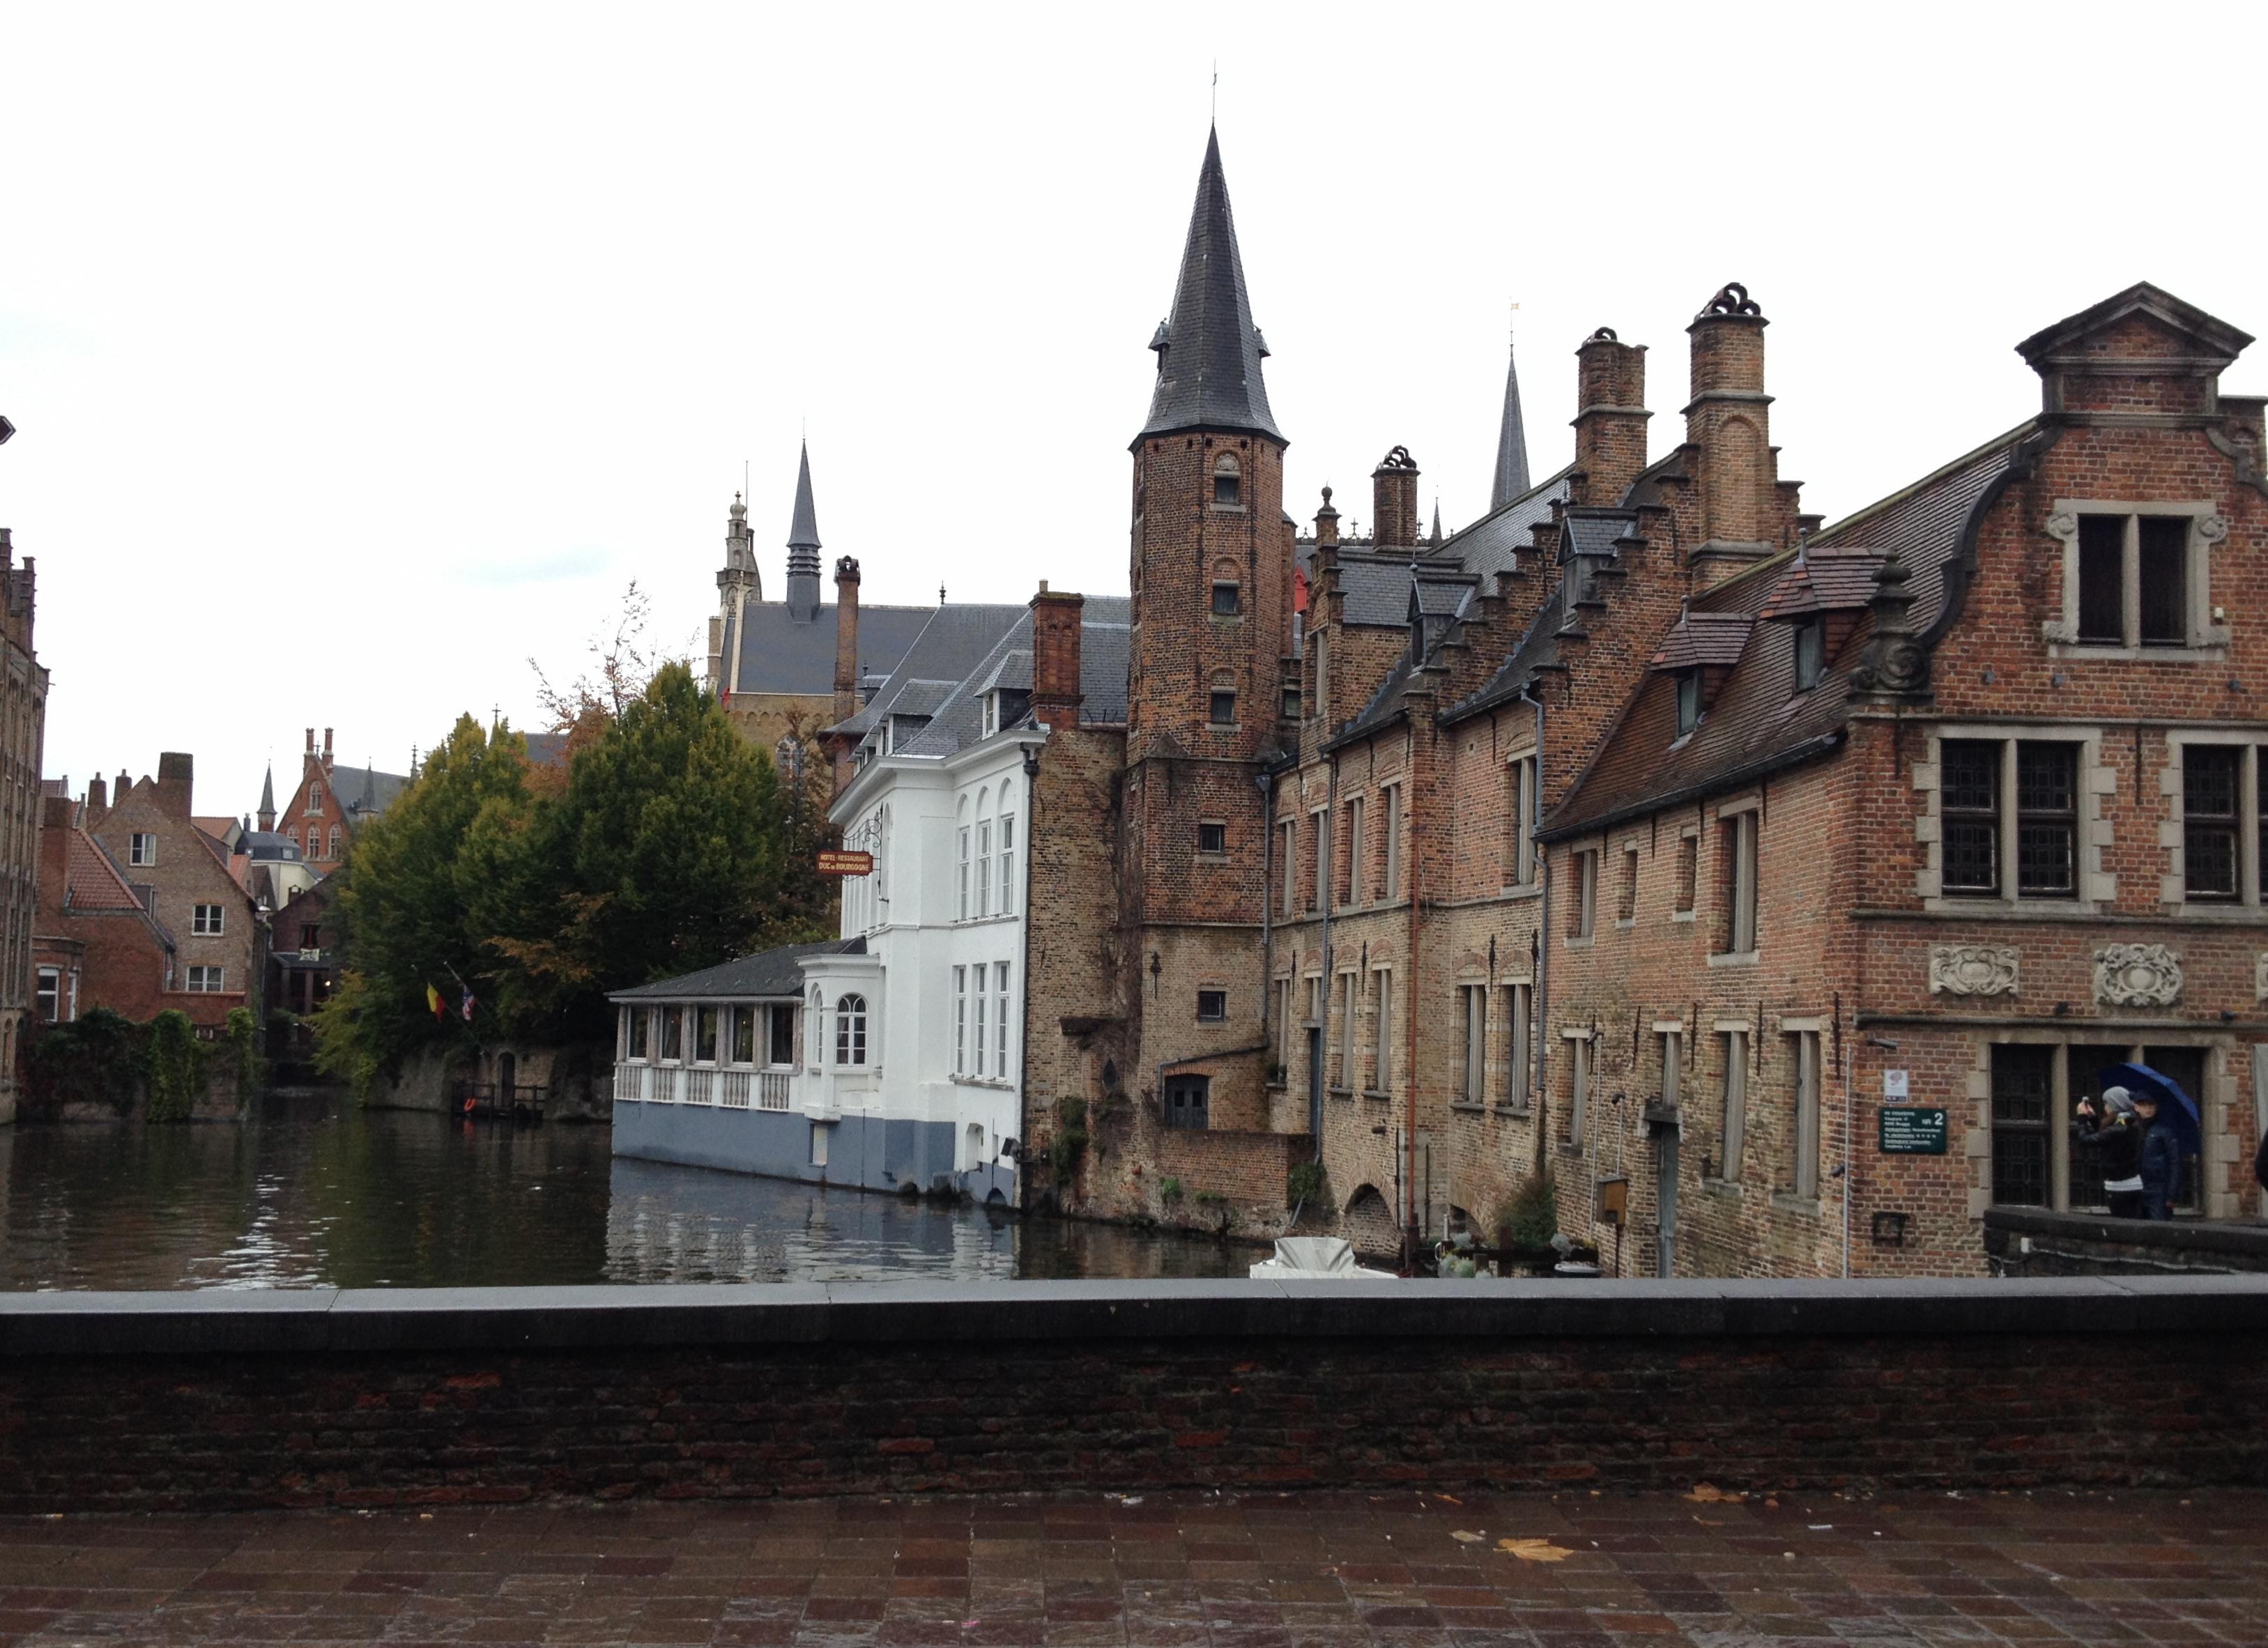 Brugge!